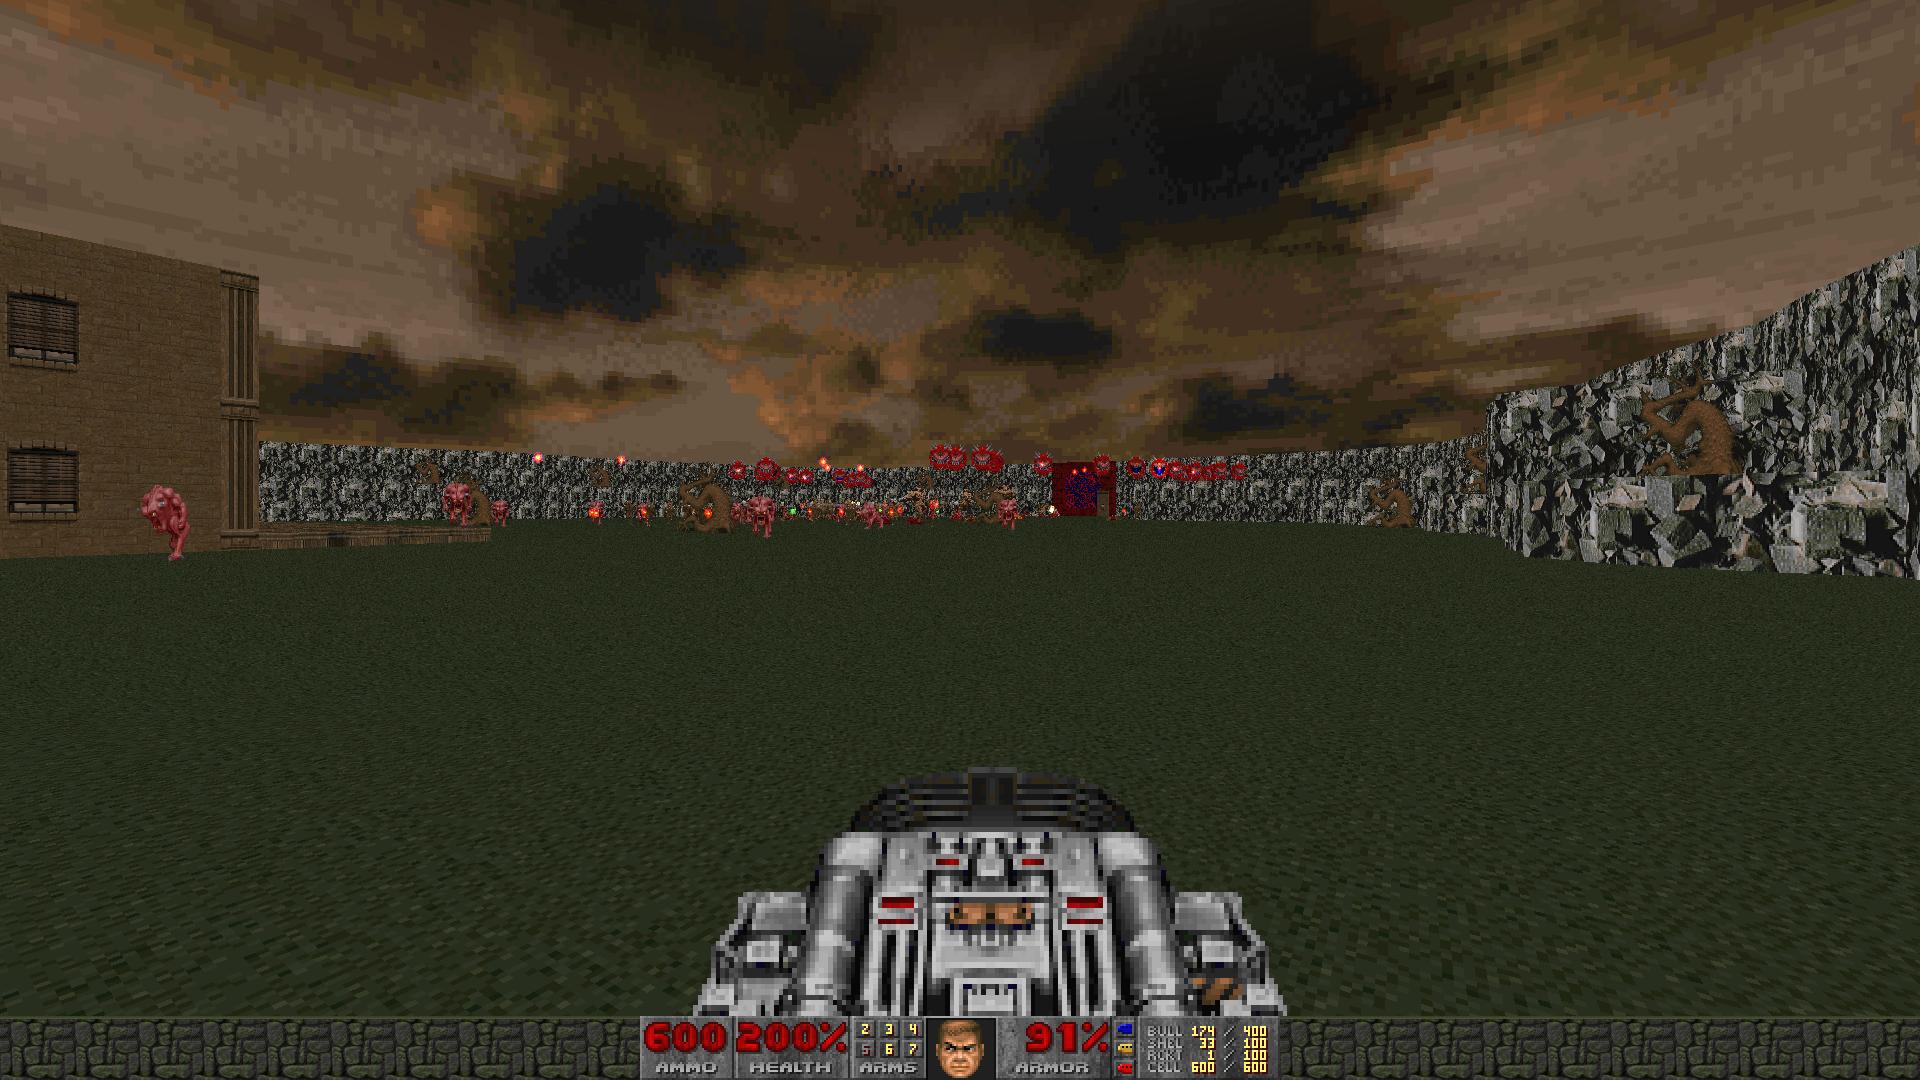 Screenshot_Doom_20200401_174826.png.fcf574a62a4d5fecd25e9c908b84a980.png